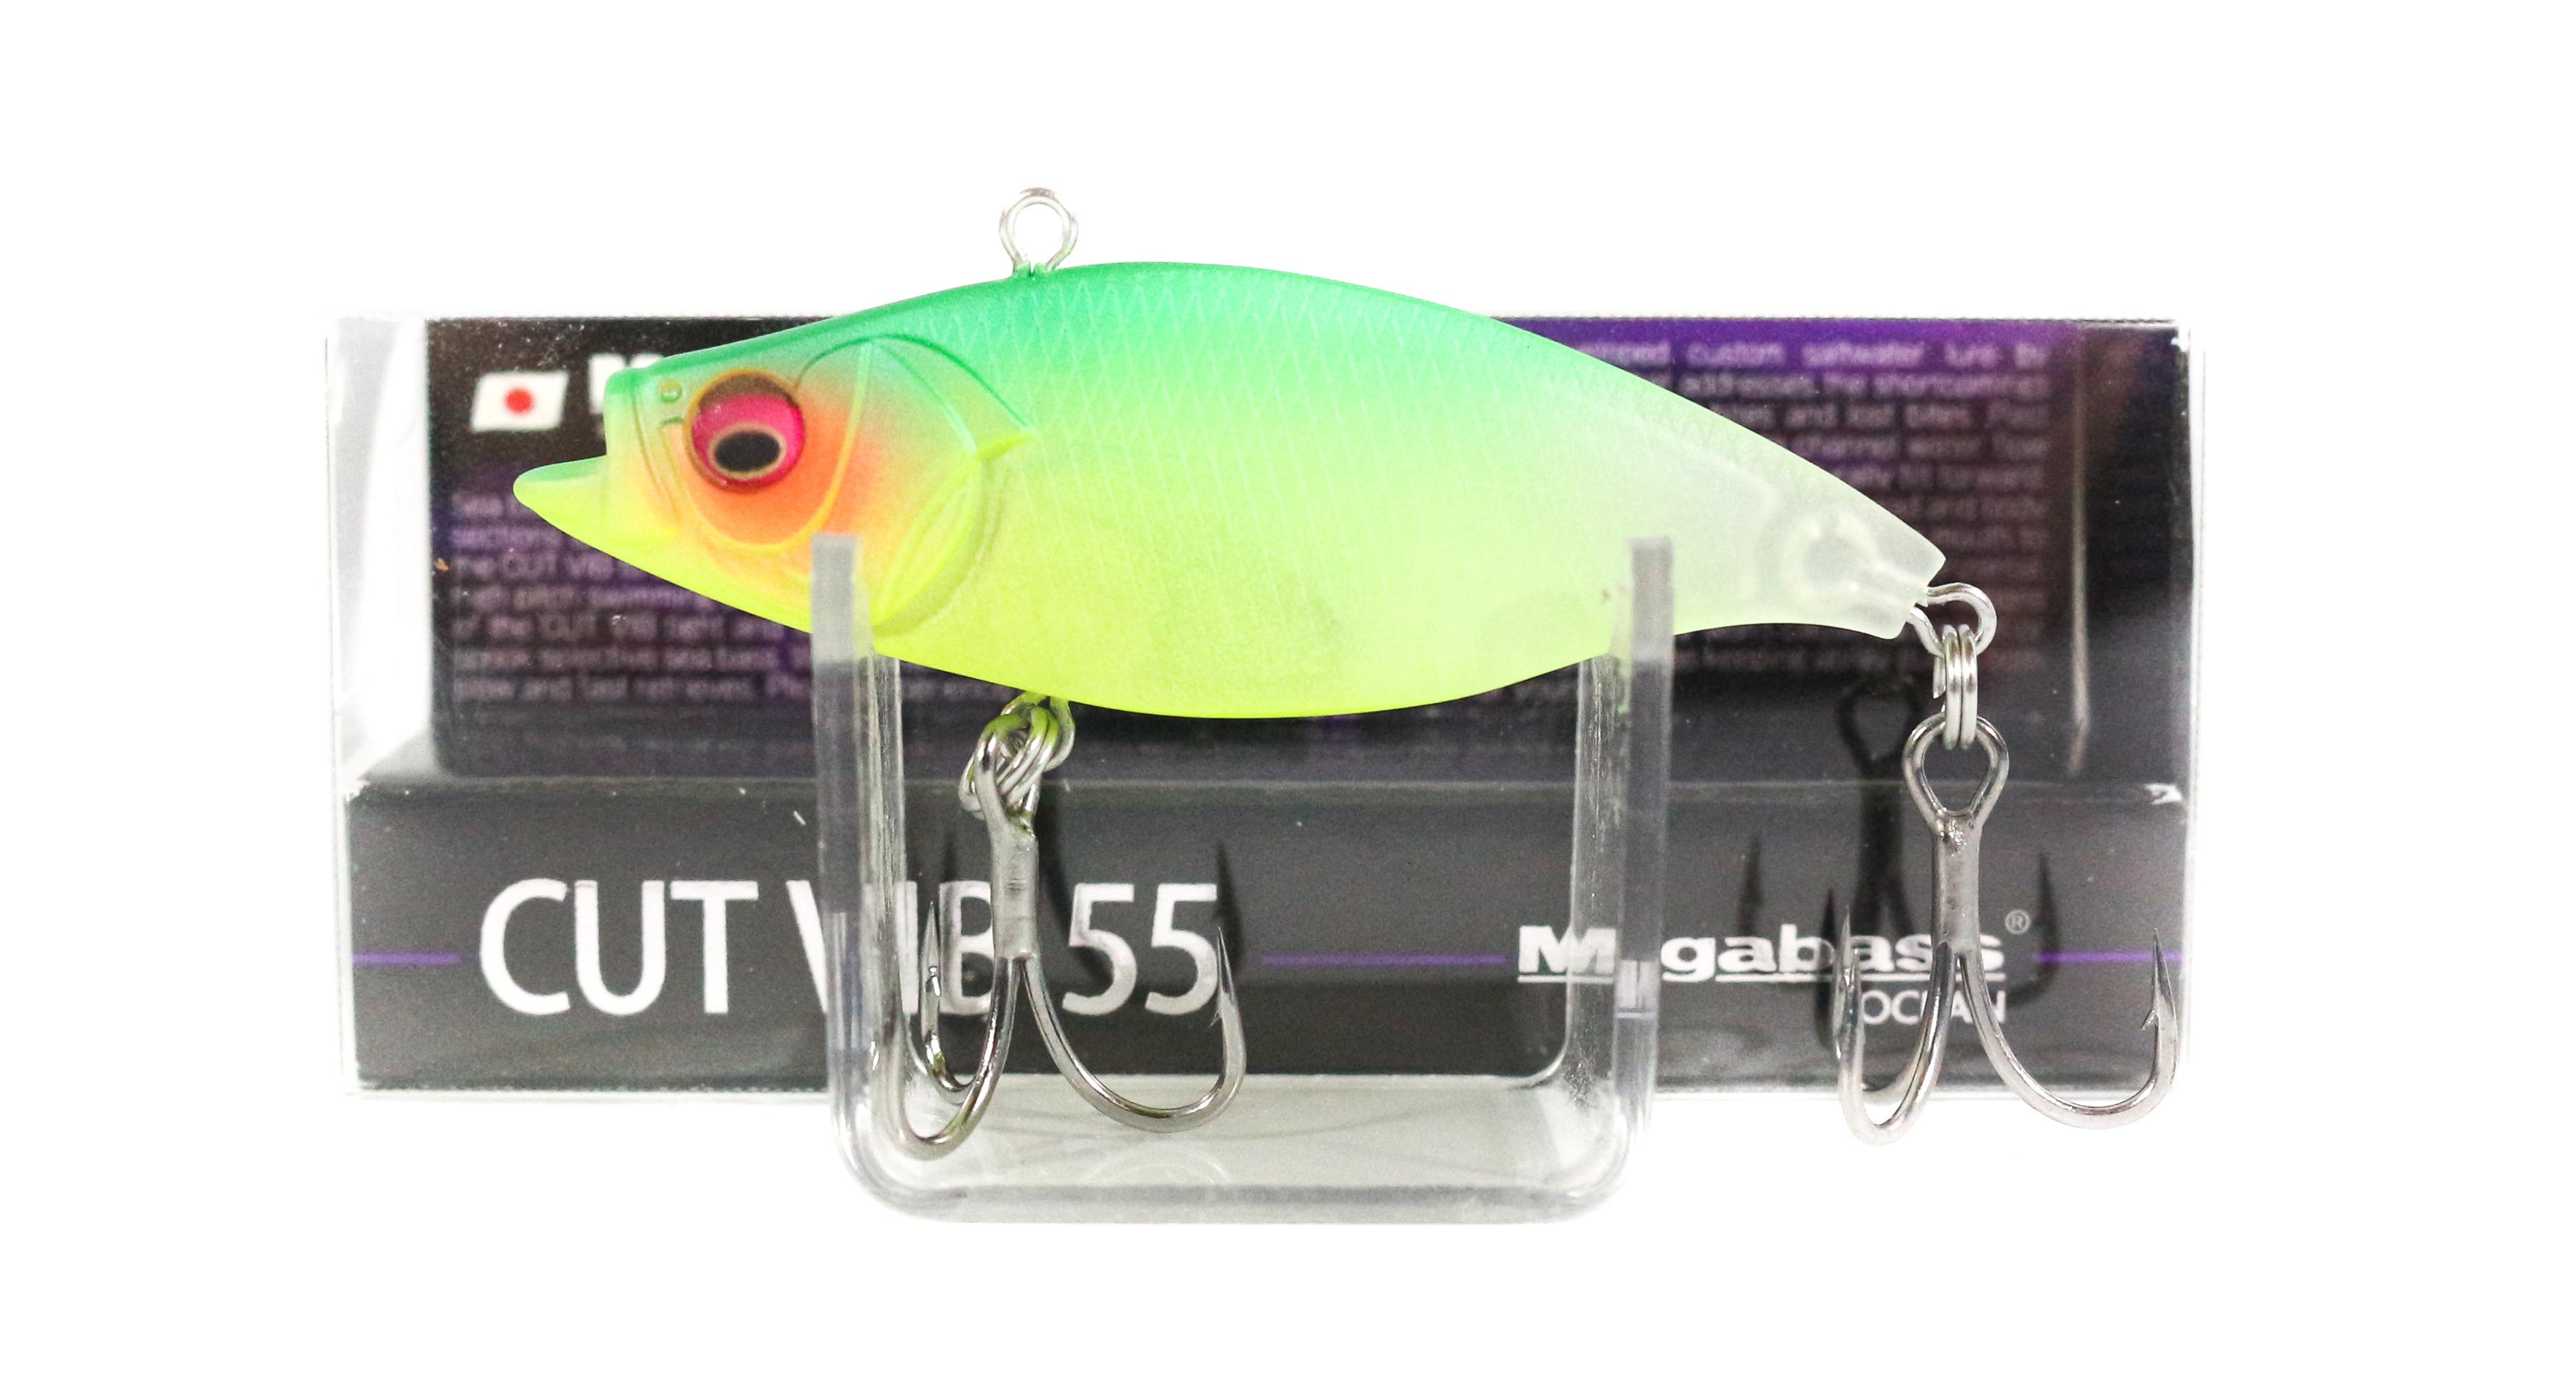 Megabass Cut Vib 55 Vibration Lure Seethrough Mat Lime (7372)